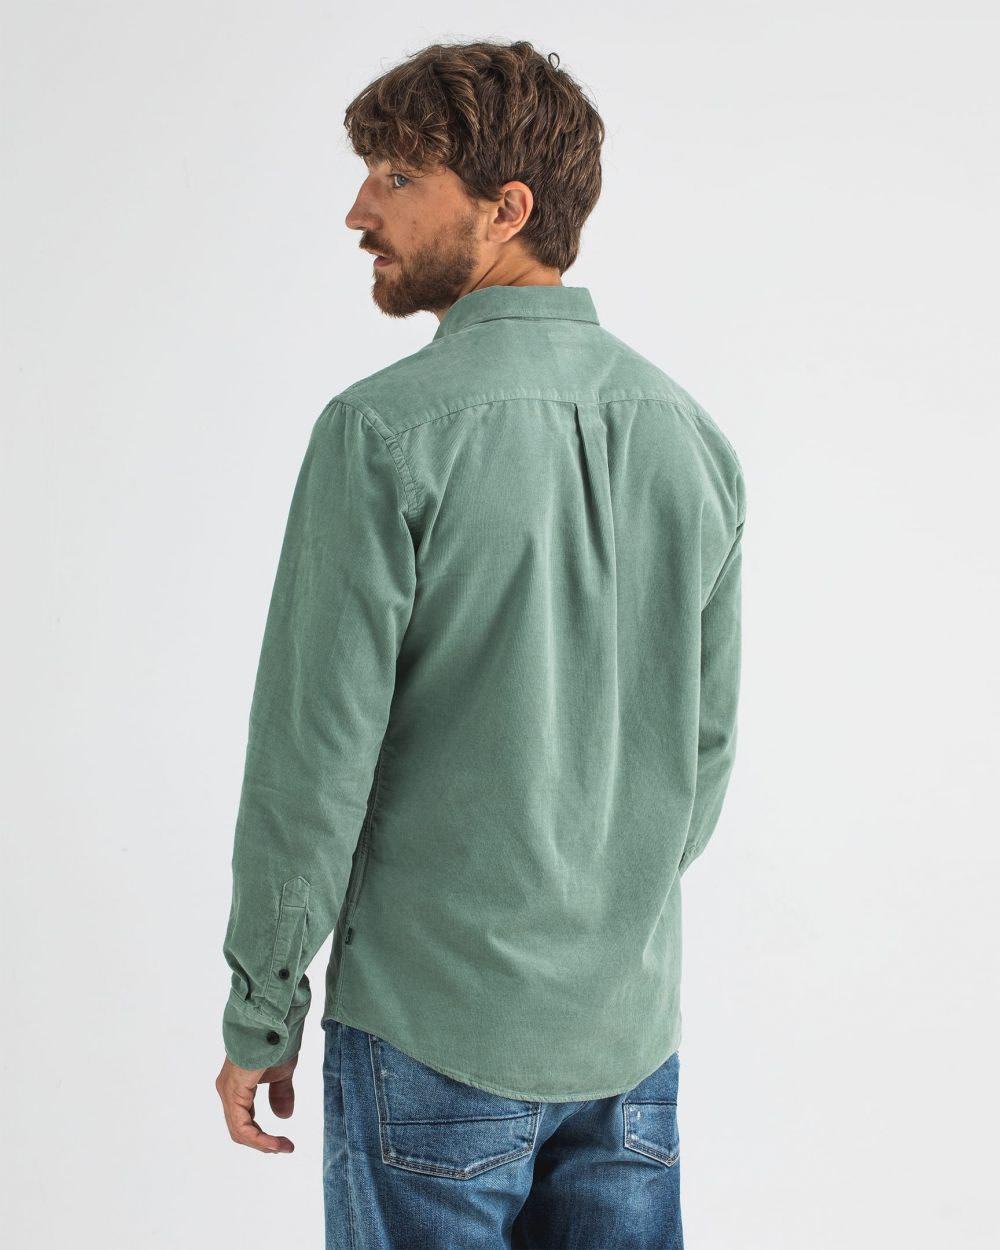 Robbins babycord shirt deplhi green-5